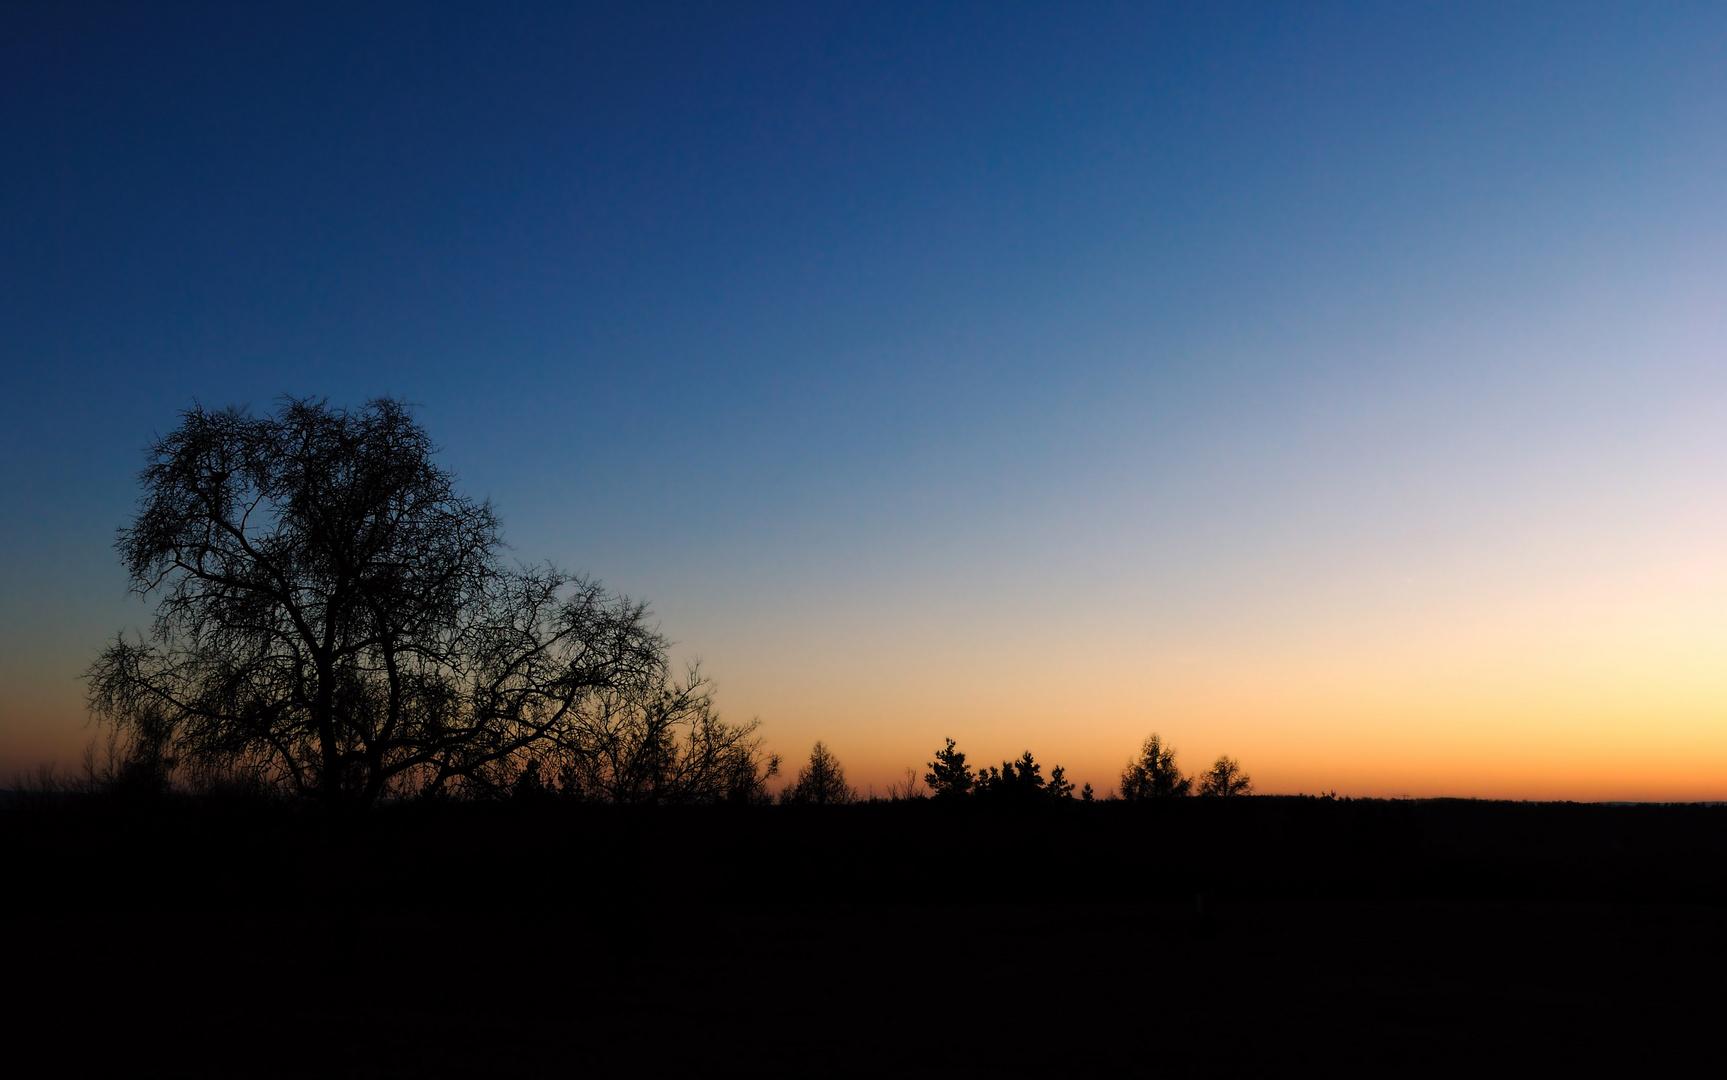 Sunset at ladronka